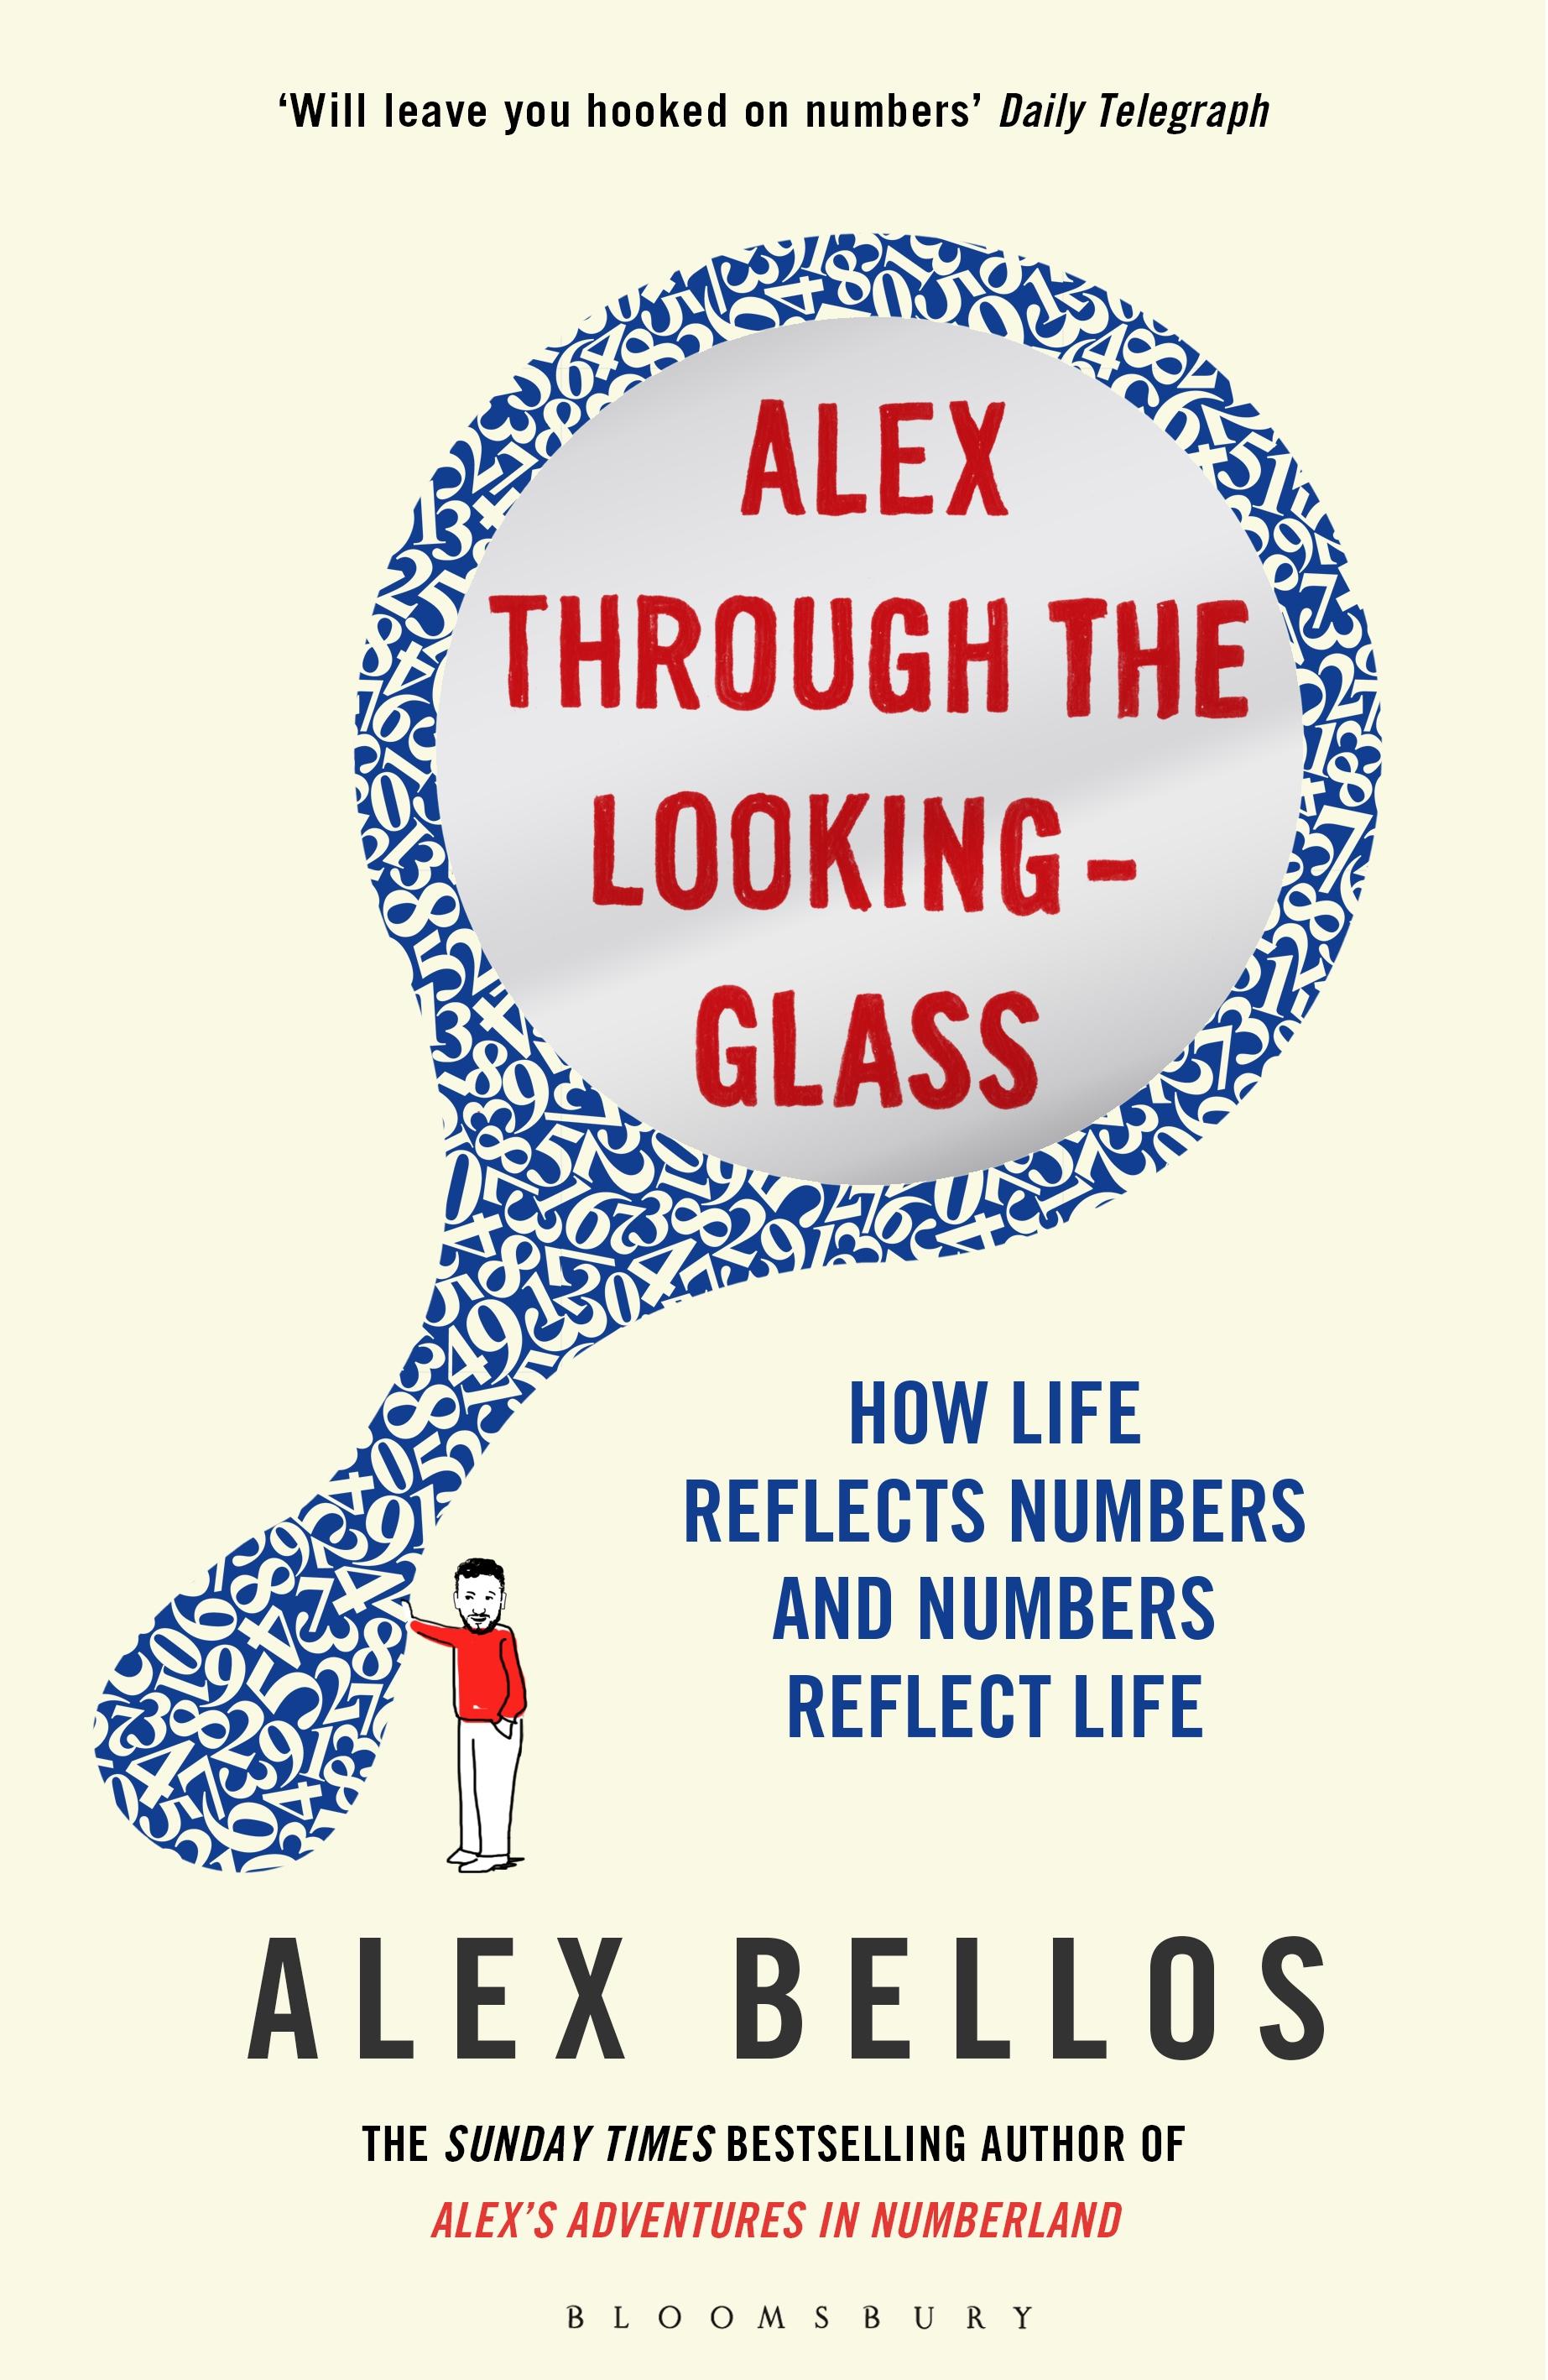 alex bellos book jacket.jpg